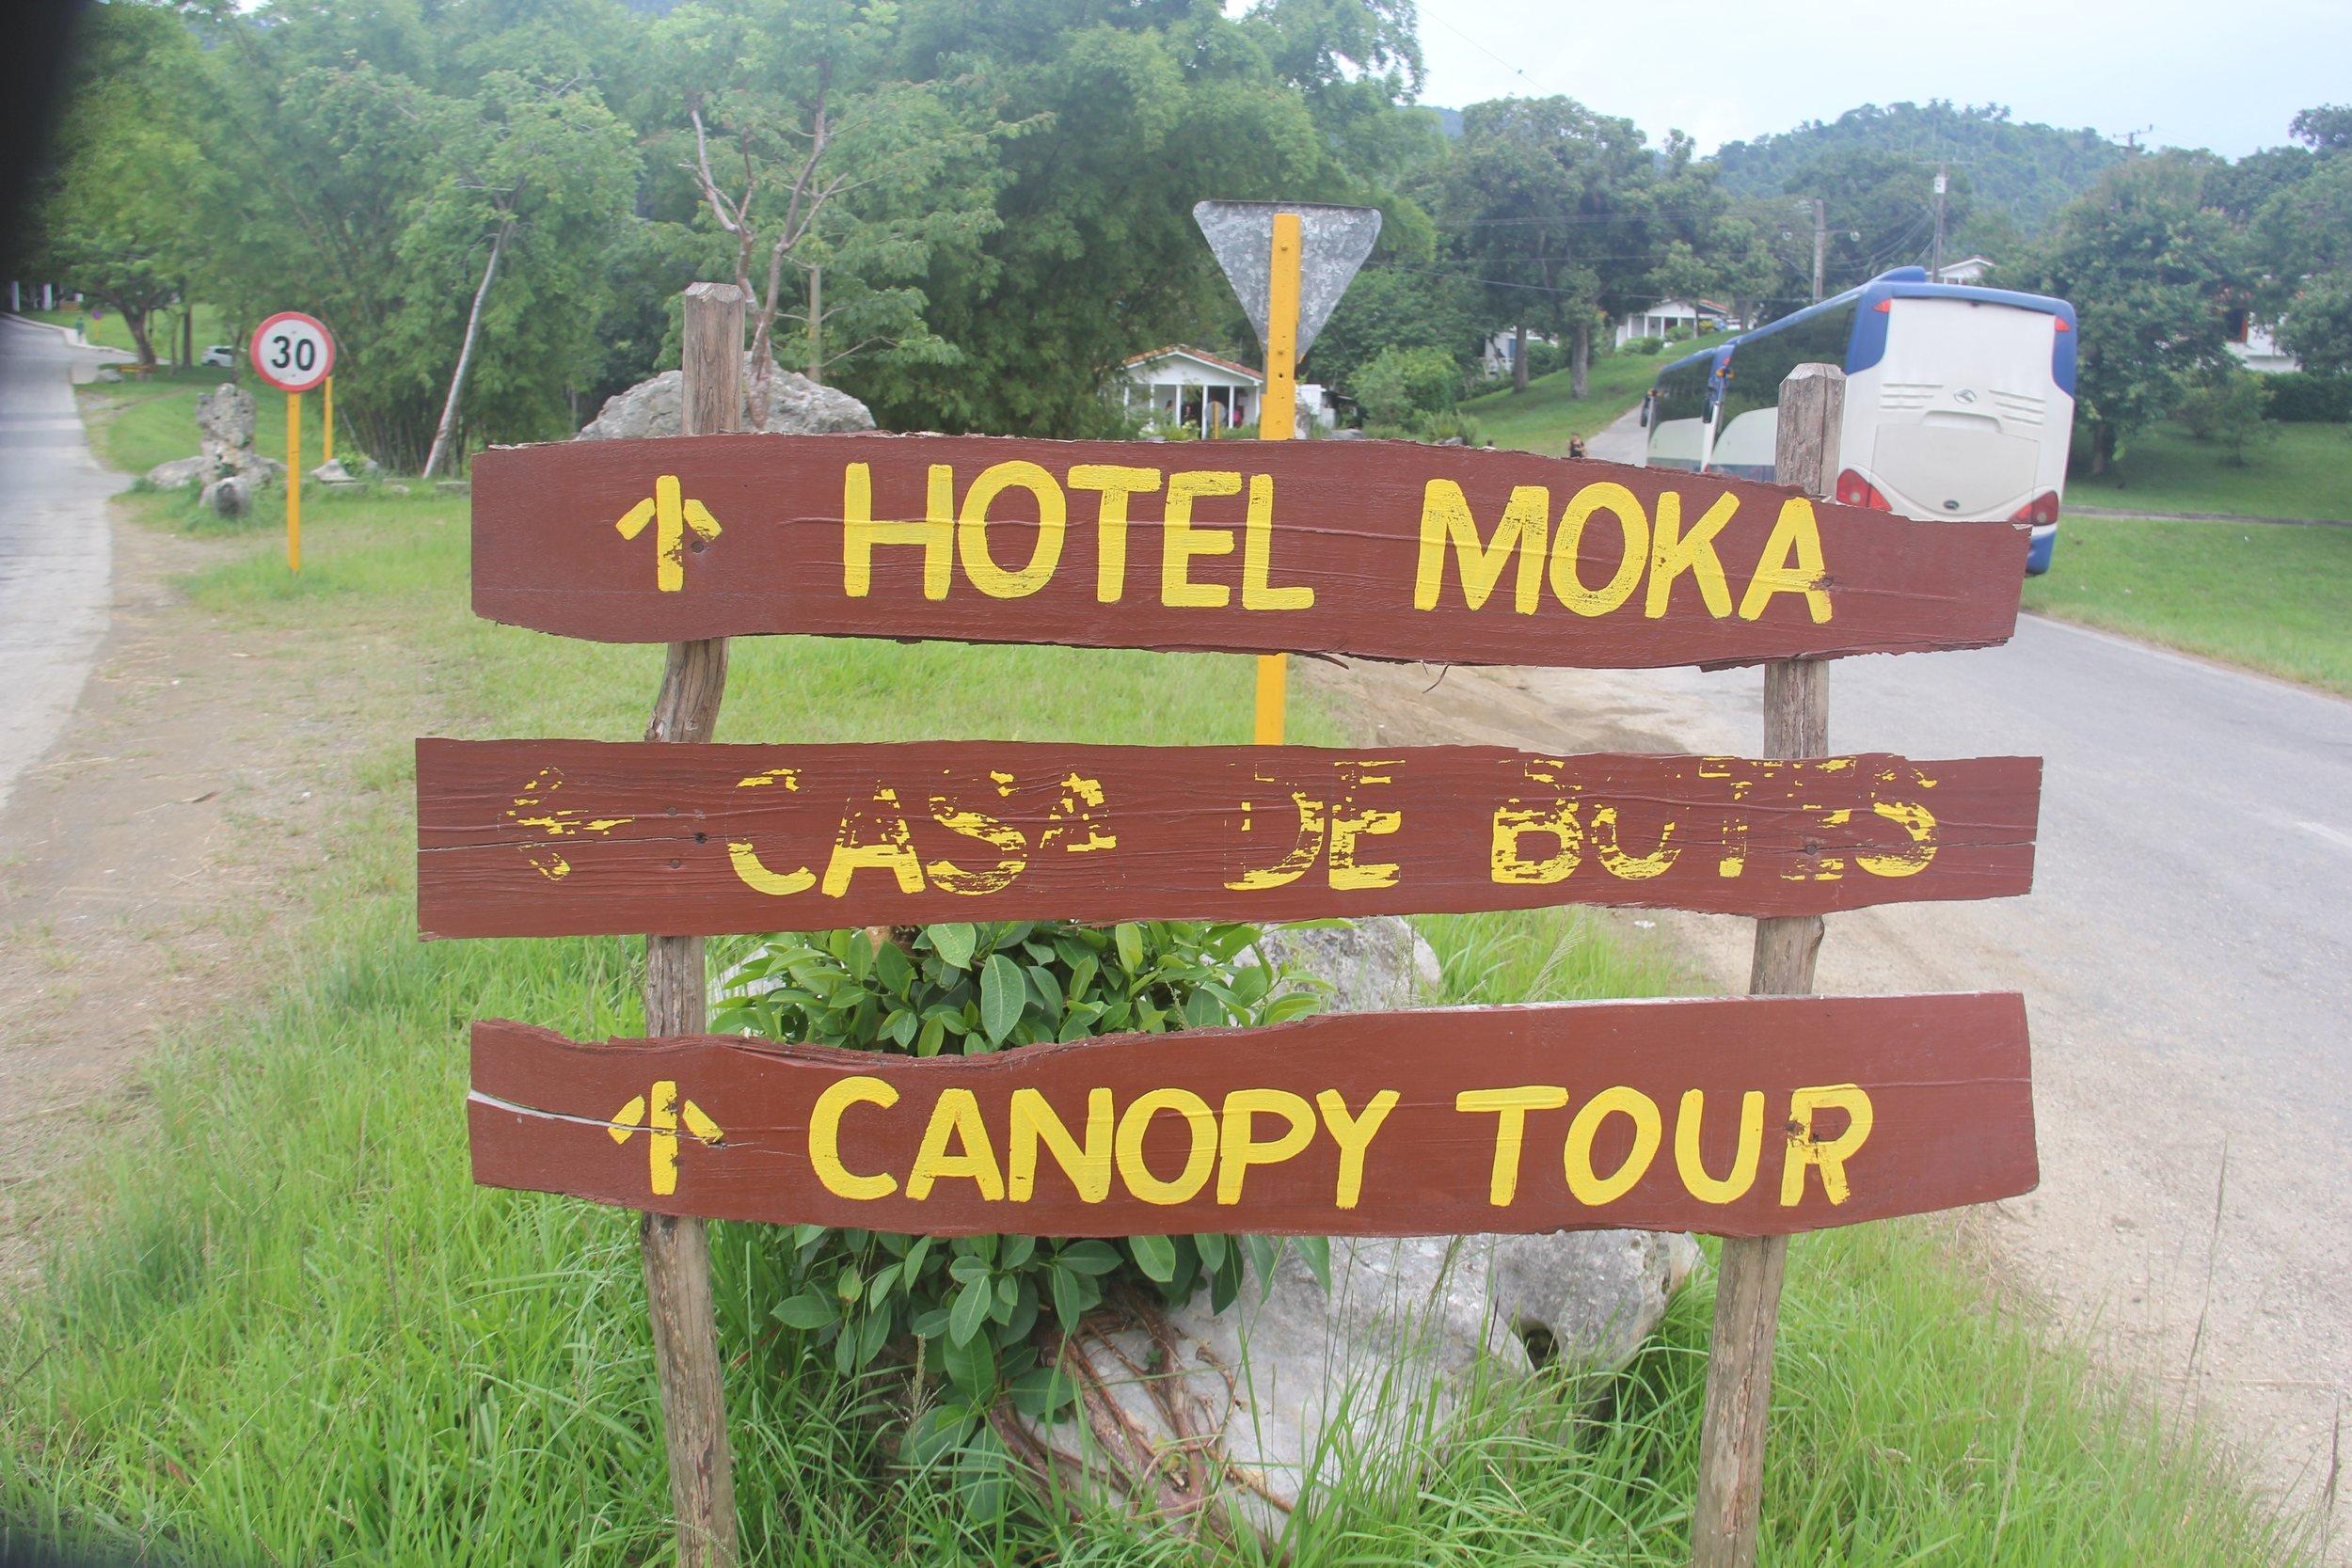 Hotel Moka sign